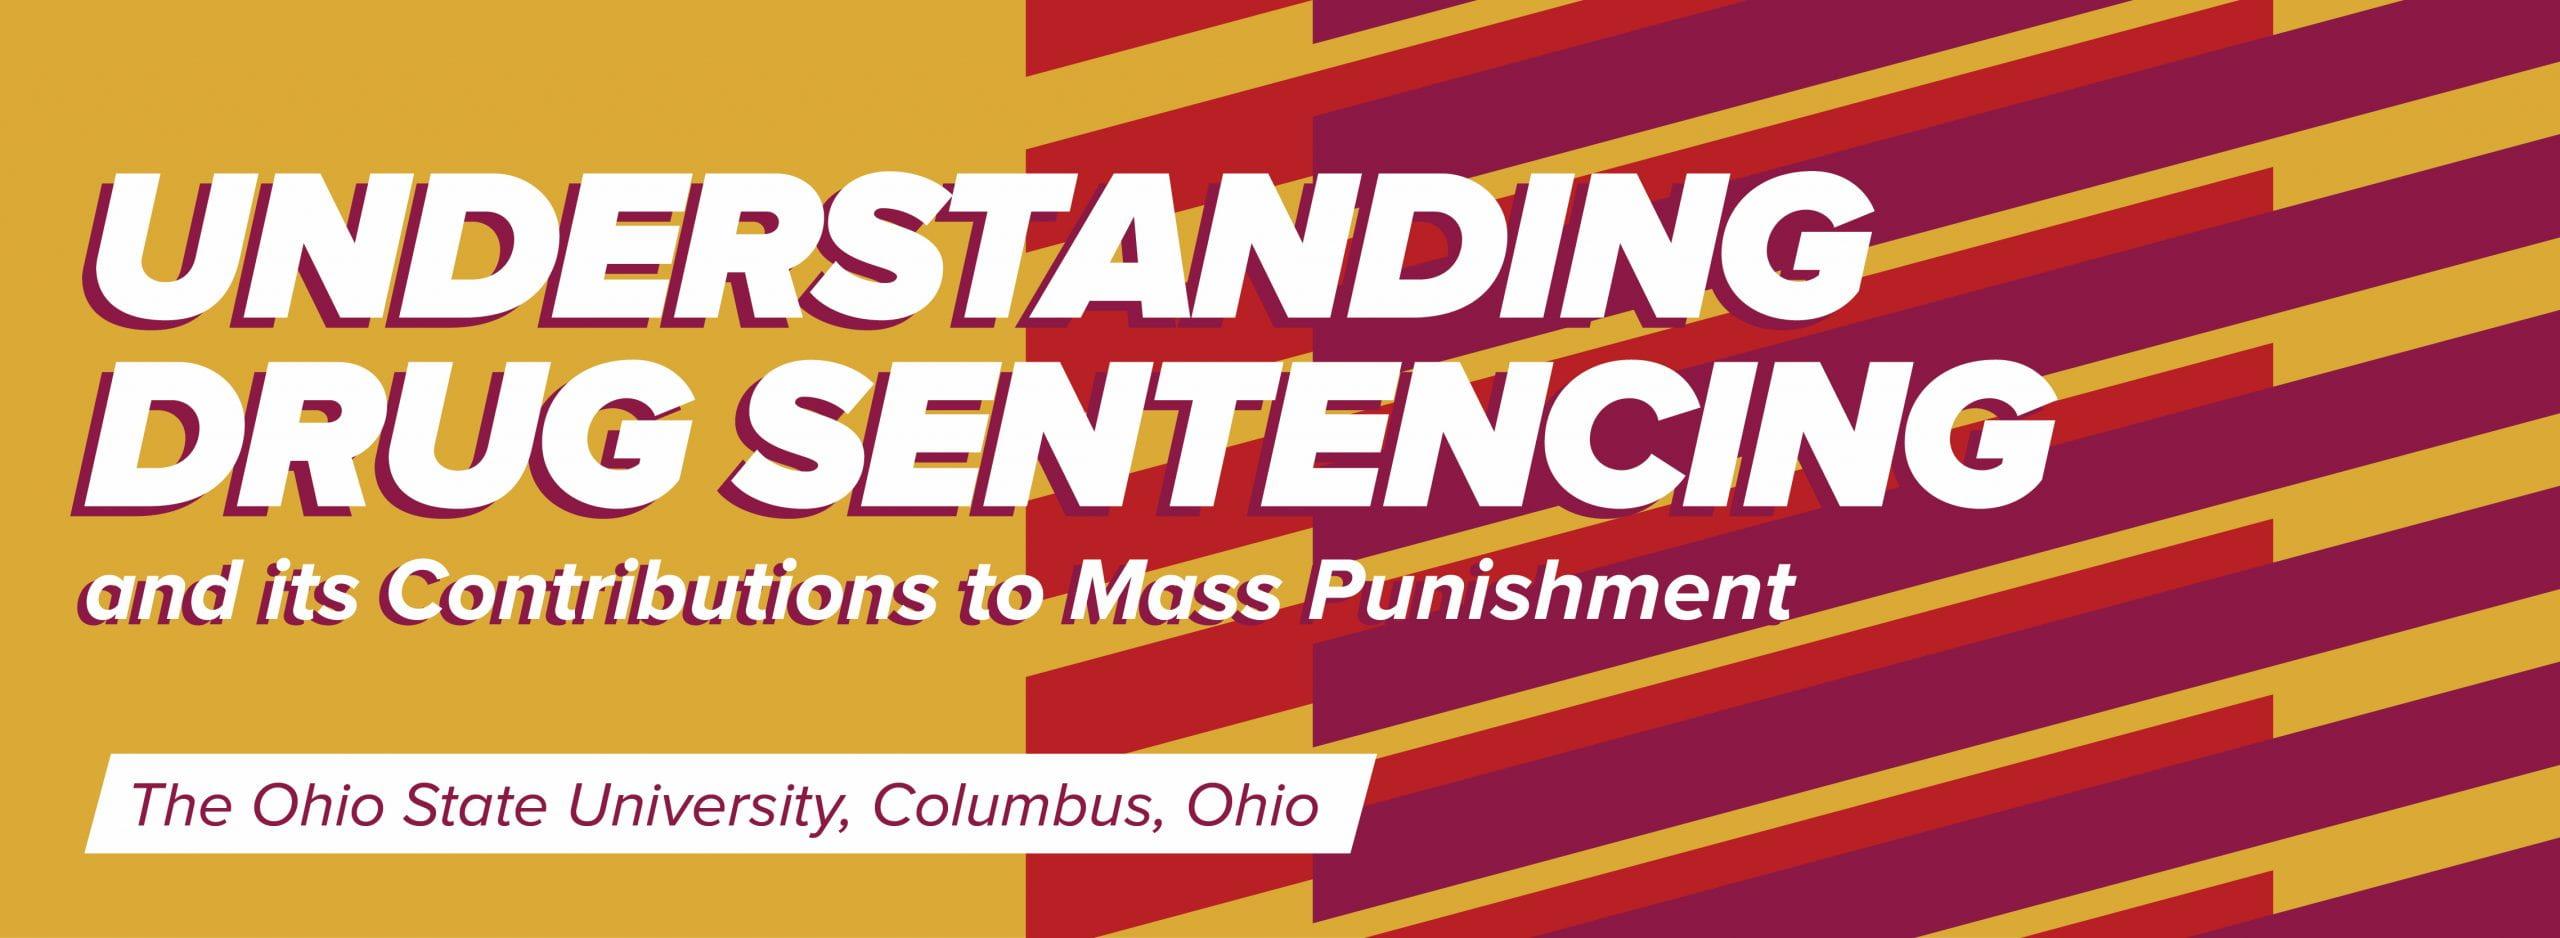 Understanding Drug Sentencing and its Contributions to Mass Punishment, The Ohio State University, Columbus, Ohio